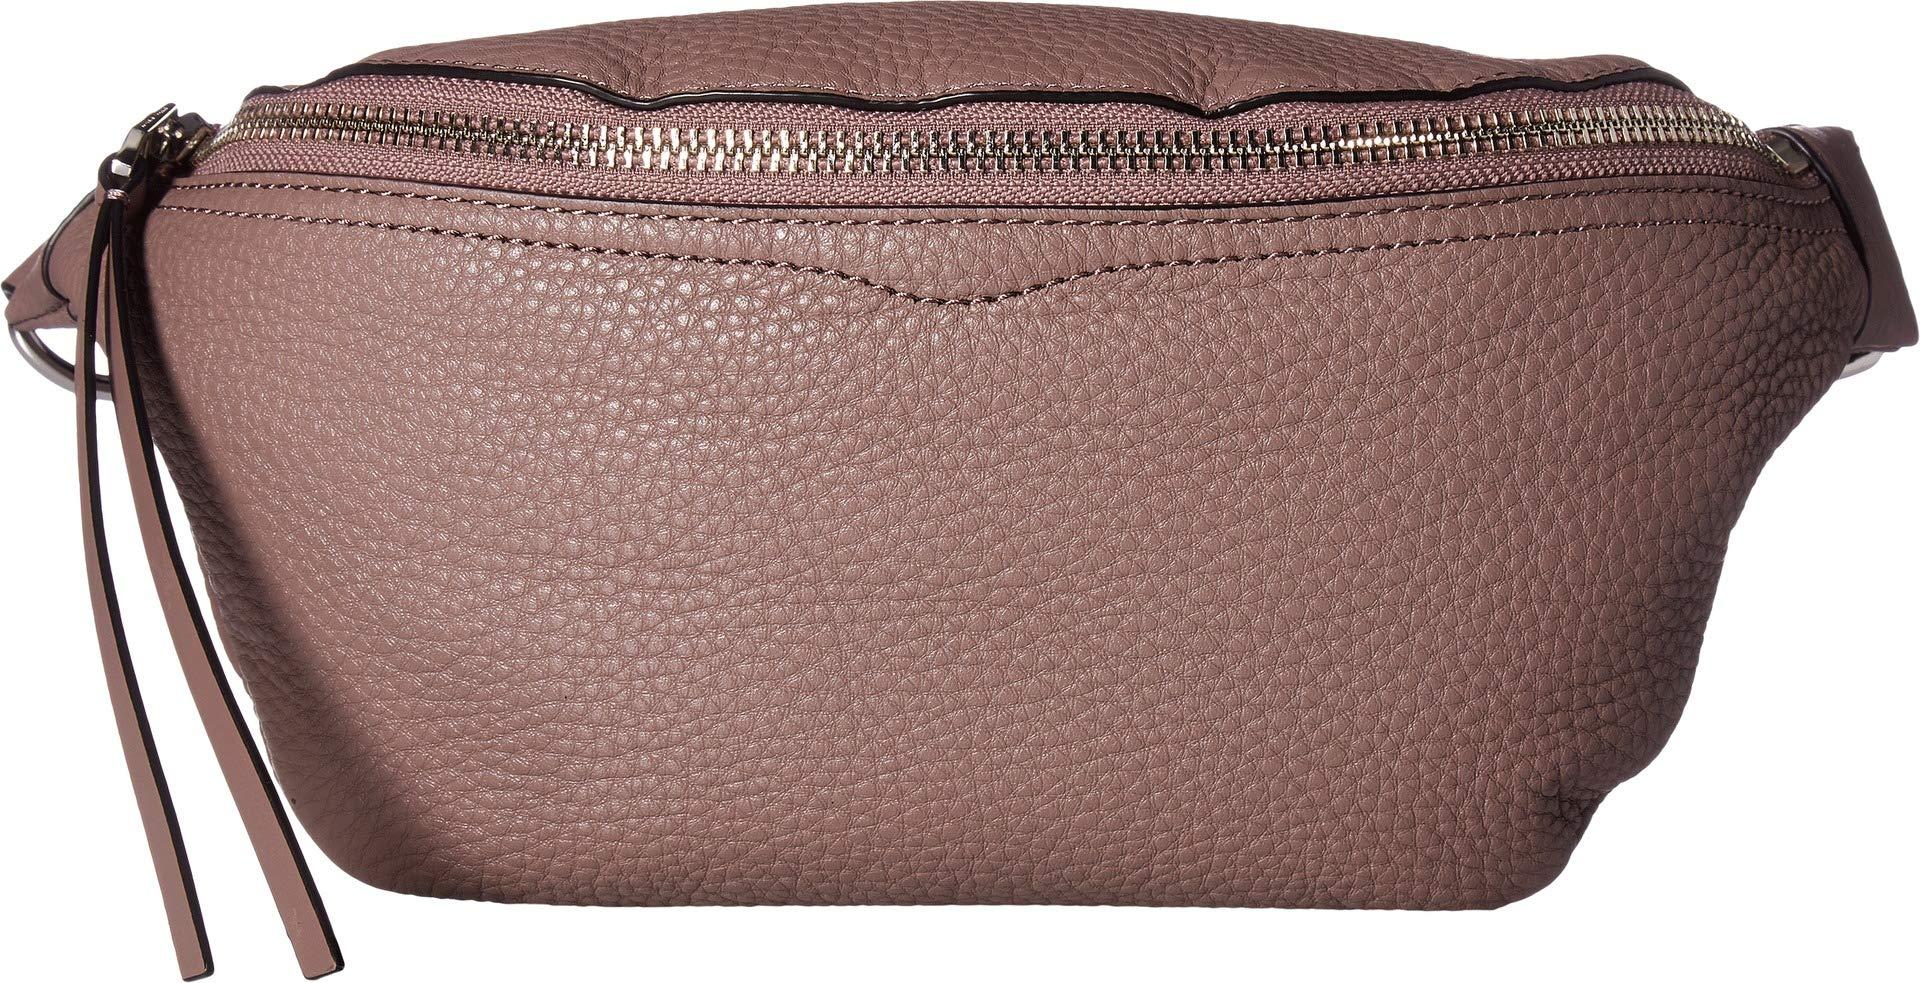 Rebecca Minkoff Women's Bree Belt Bag, Mink, Grey, One Size